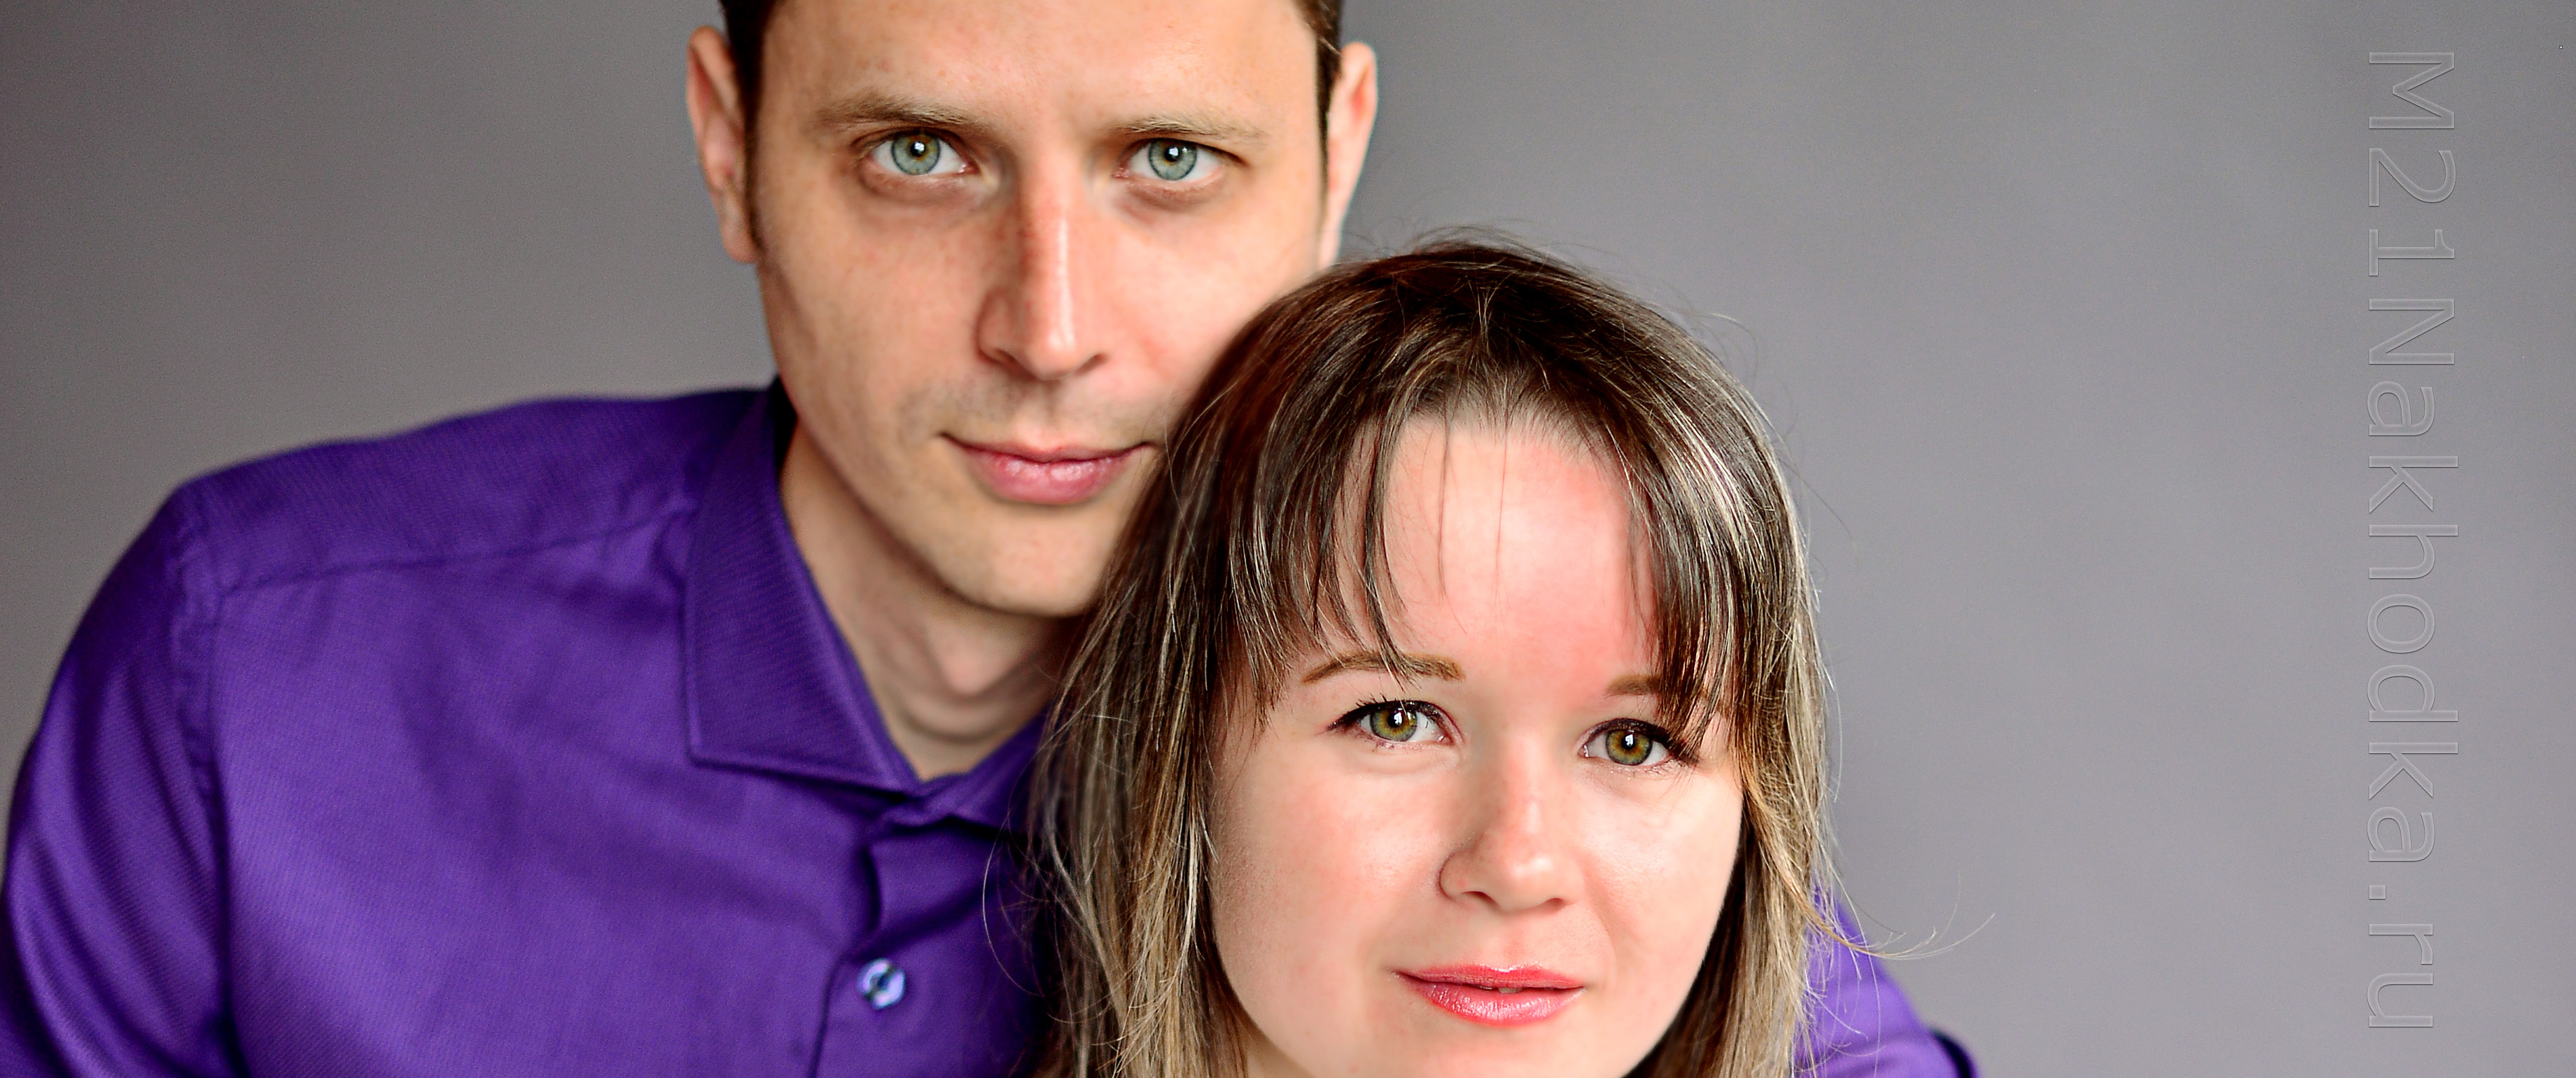 Сергей и Анастасия, пара, thumb